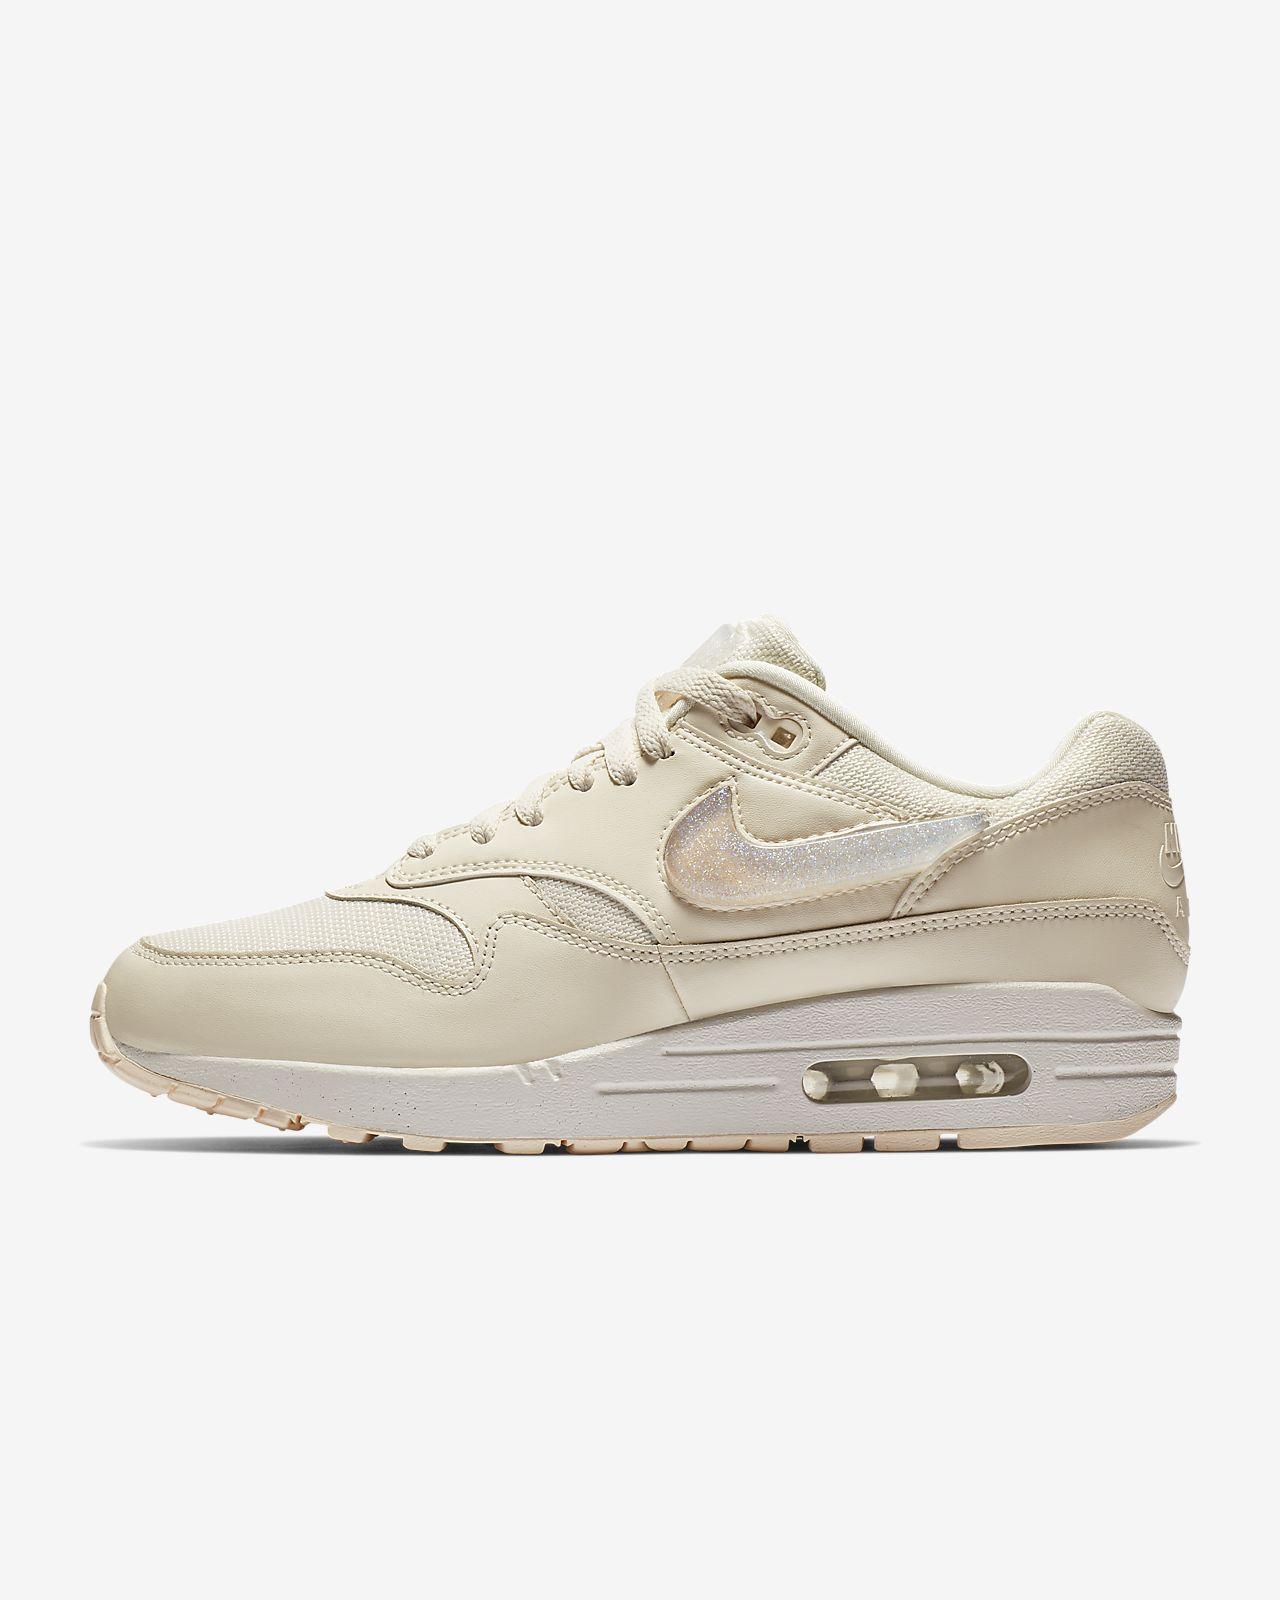 Nike Air Max 1 Premium Women's Shoe